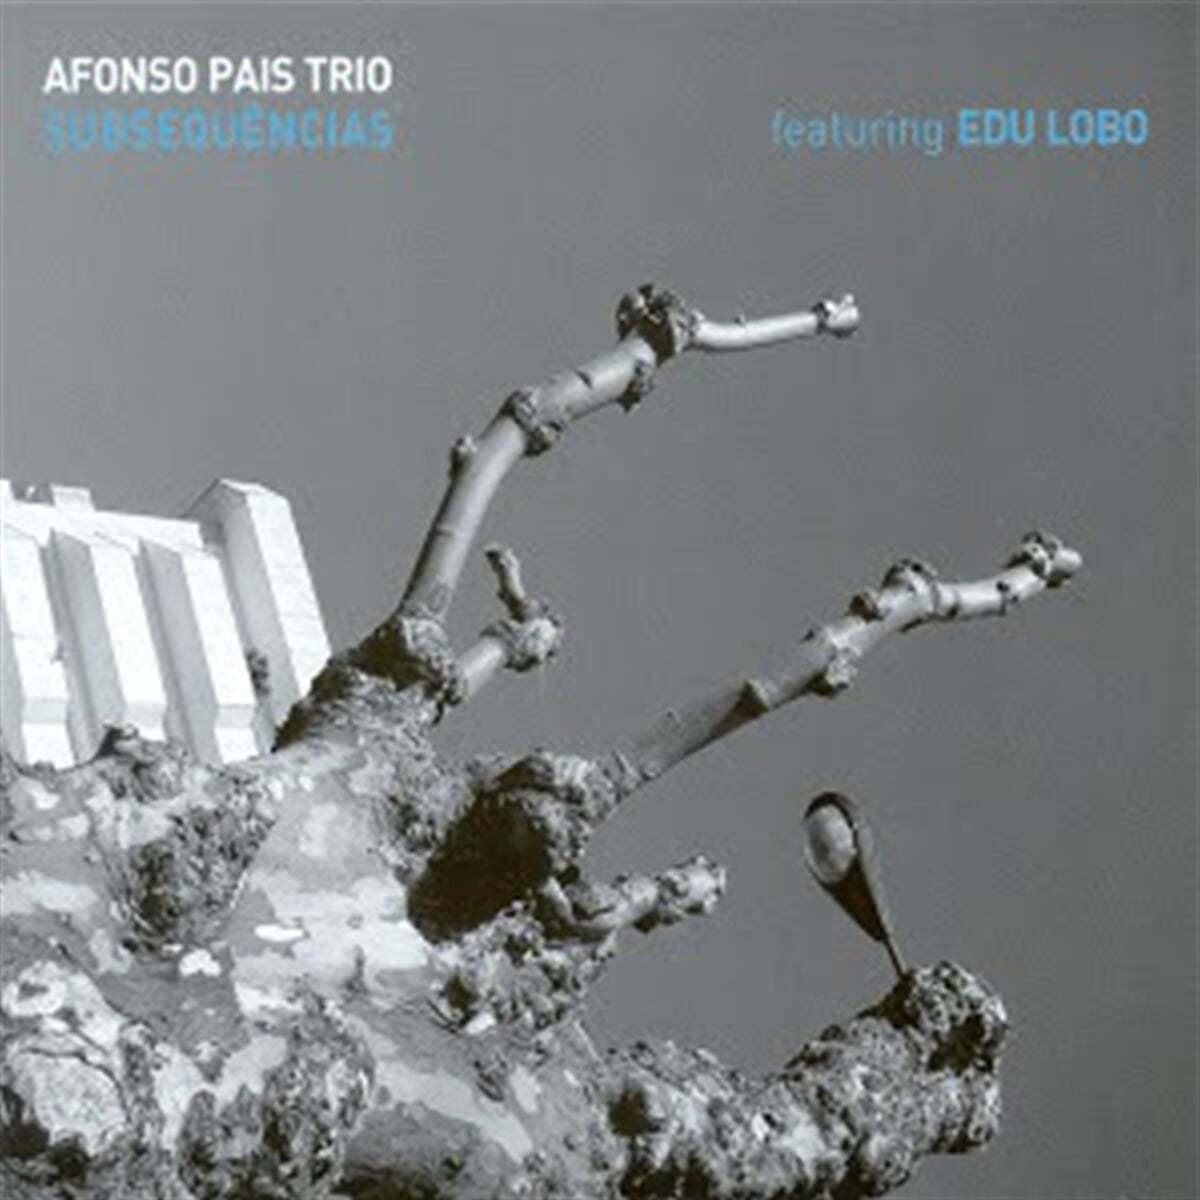 Afonso Pais Trio (아폰소 파이즈 트리오) - Subsequencias